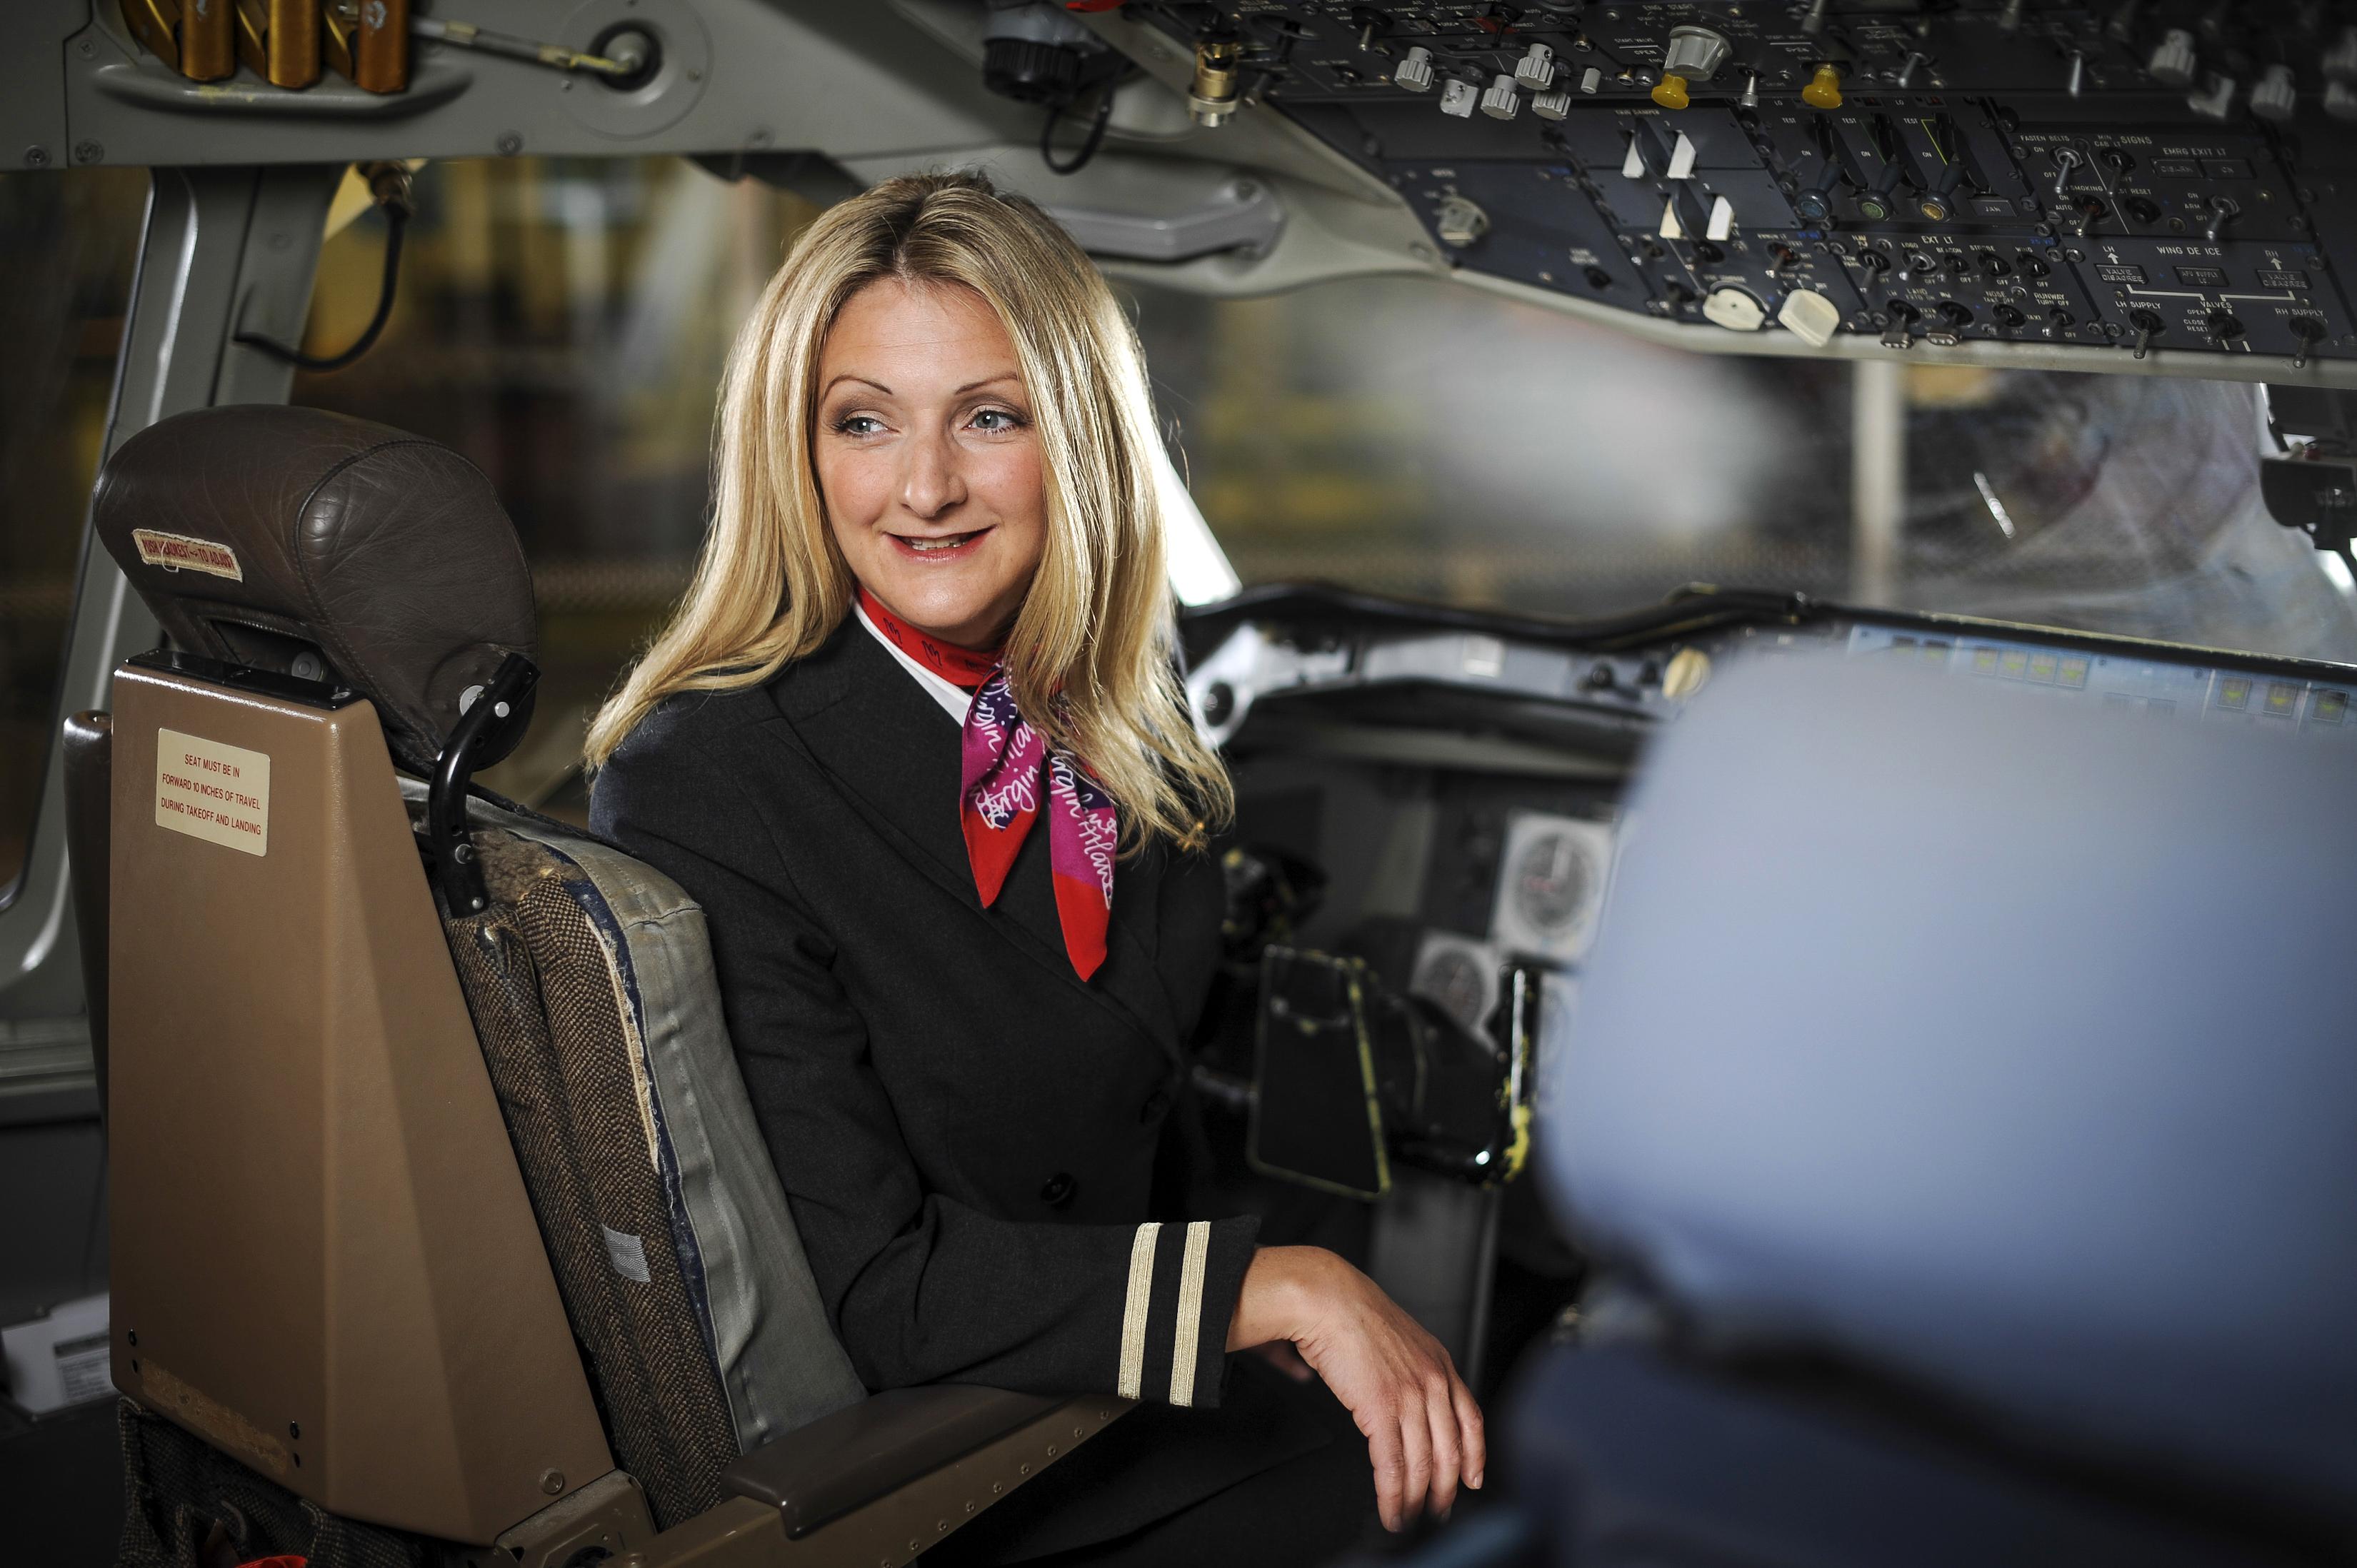 Virgin Atlantic Showcase New Uniforms By Westwood   TheDesignAir